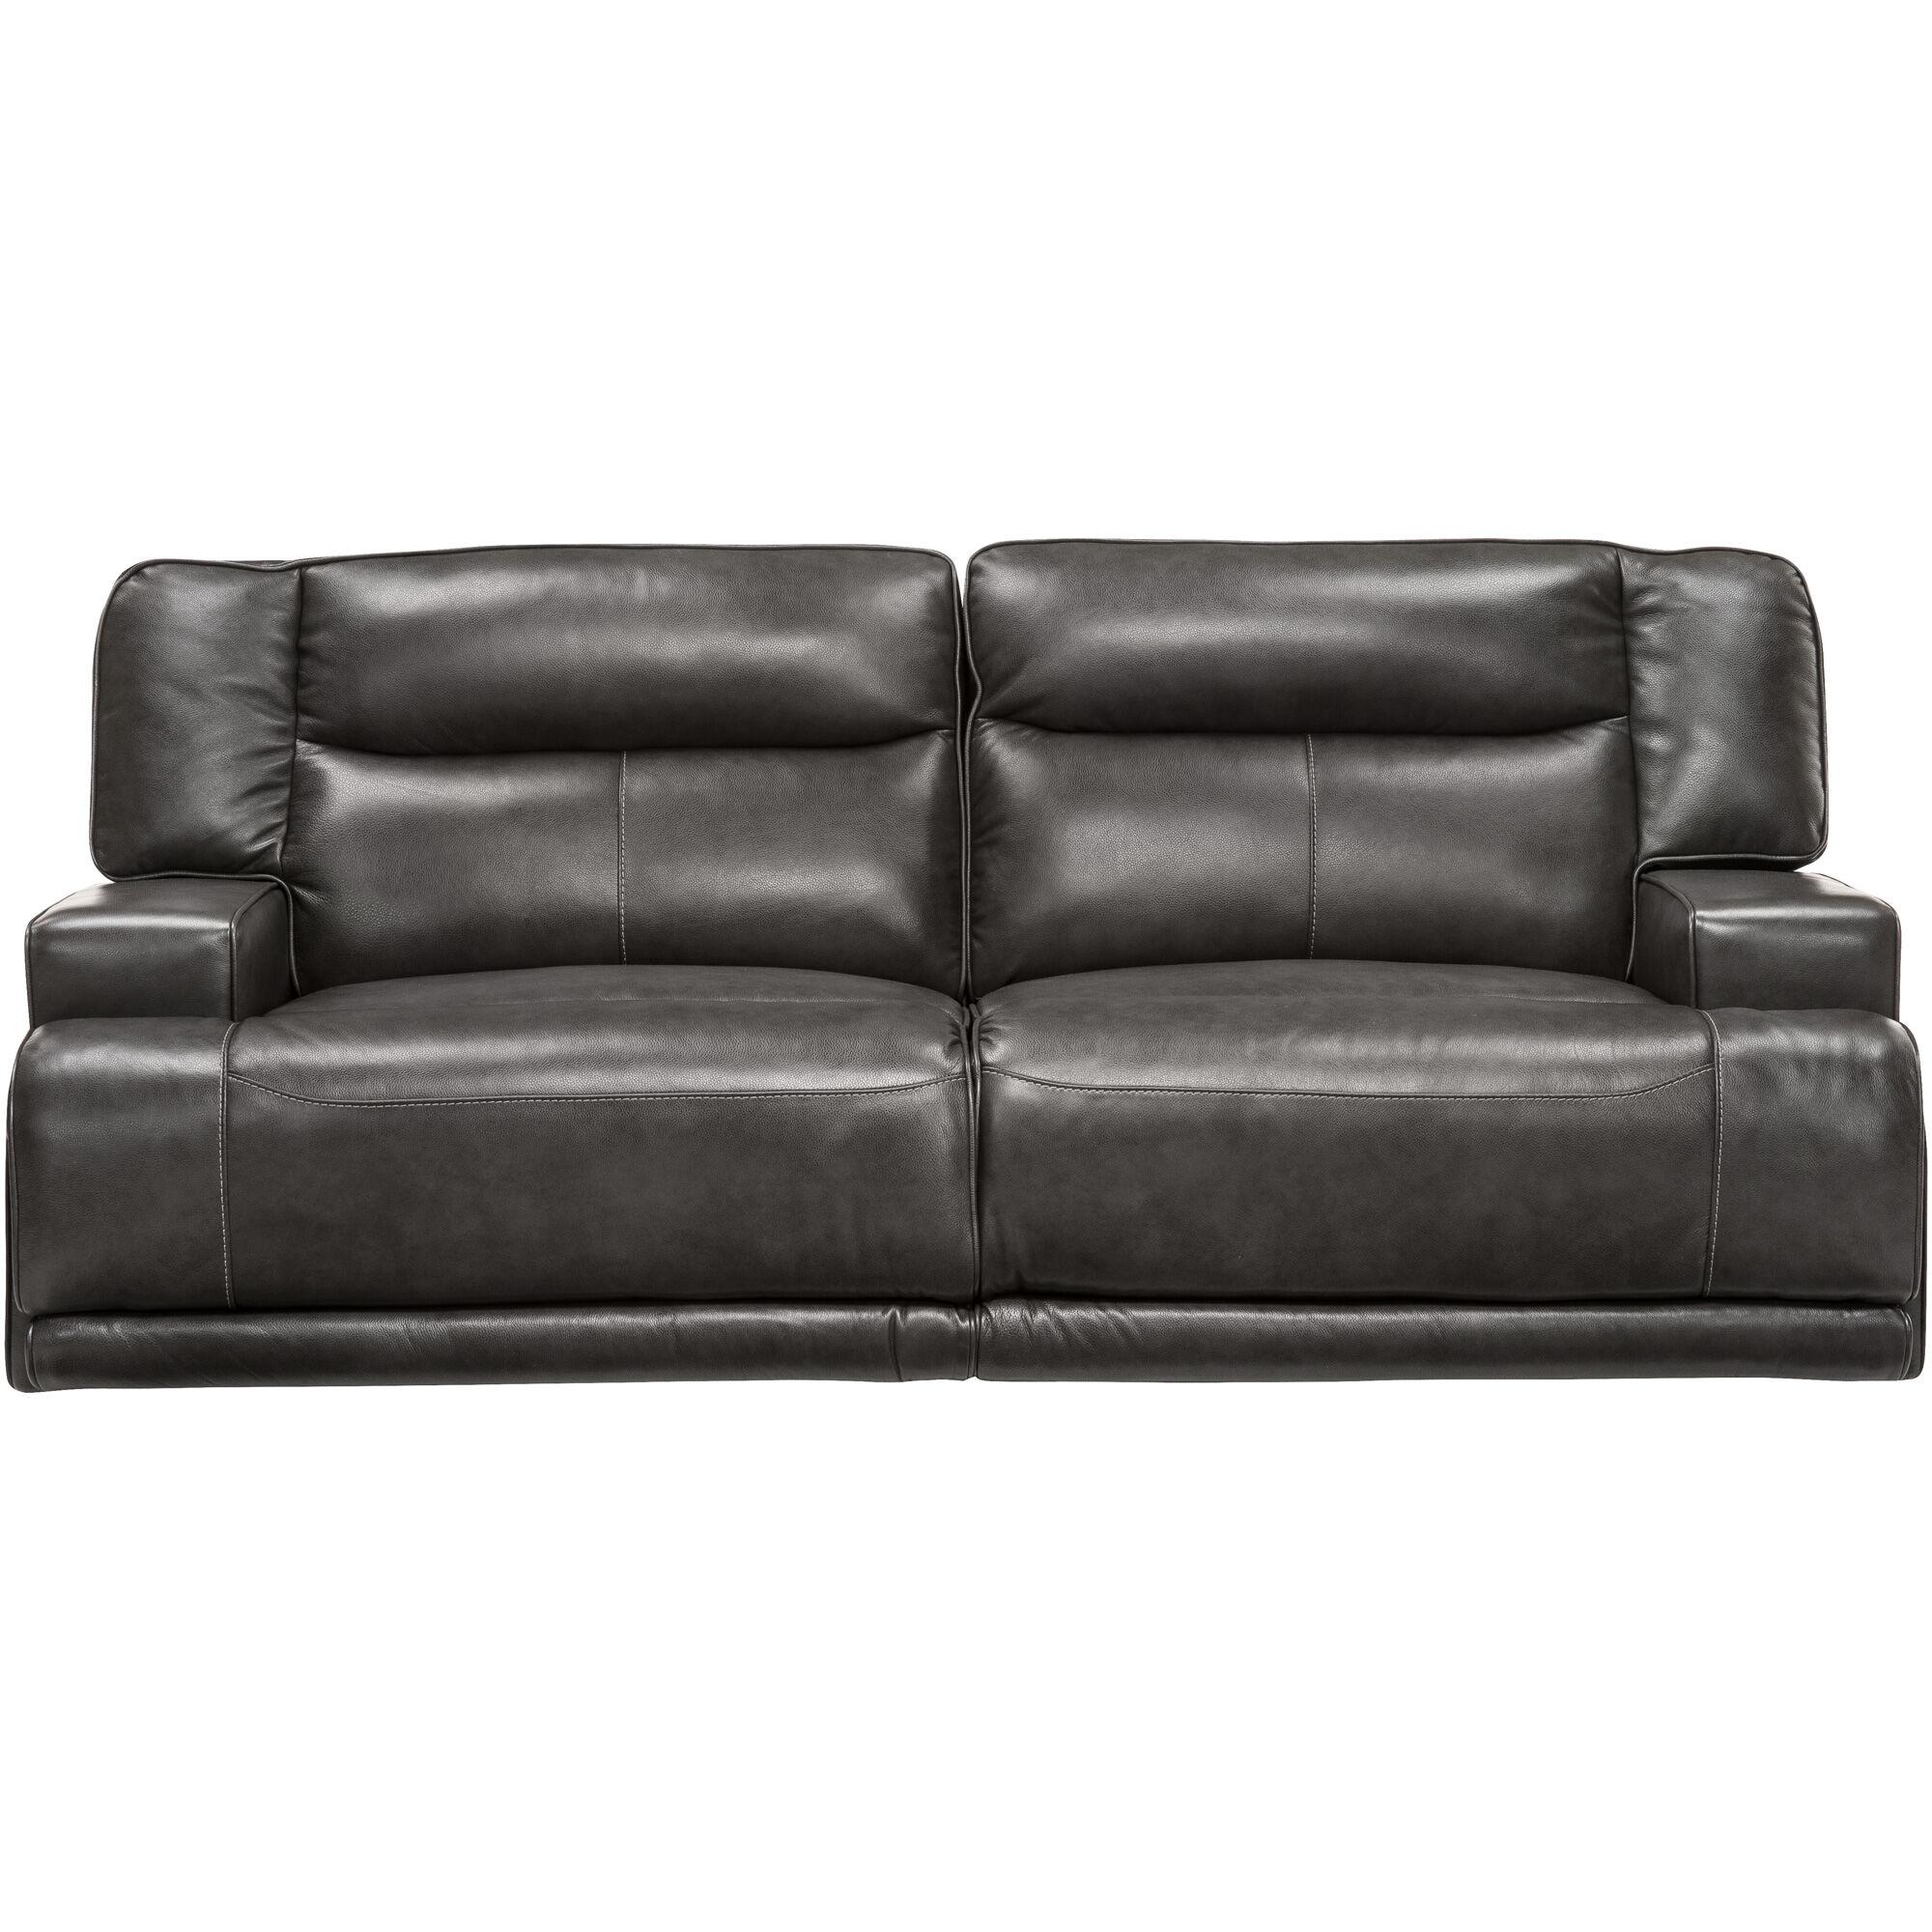 grey power reclining sofa how to restuff cushions slumberland furniture tompkins gray